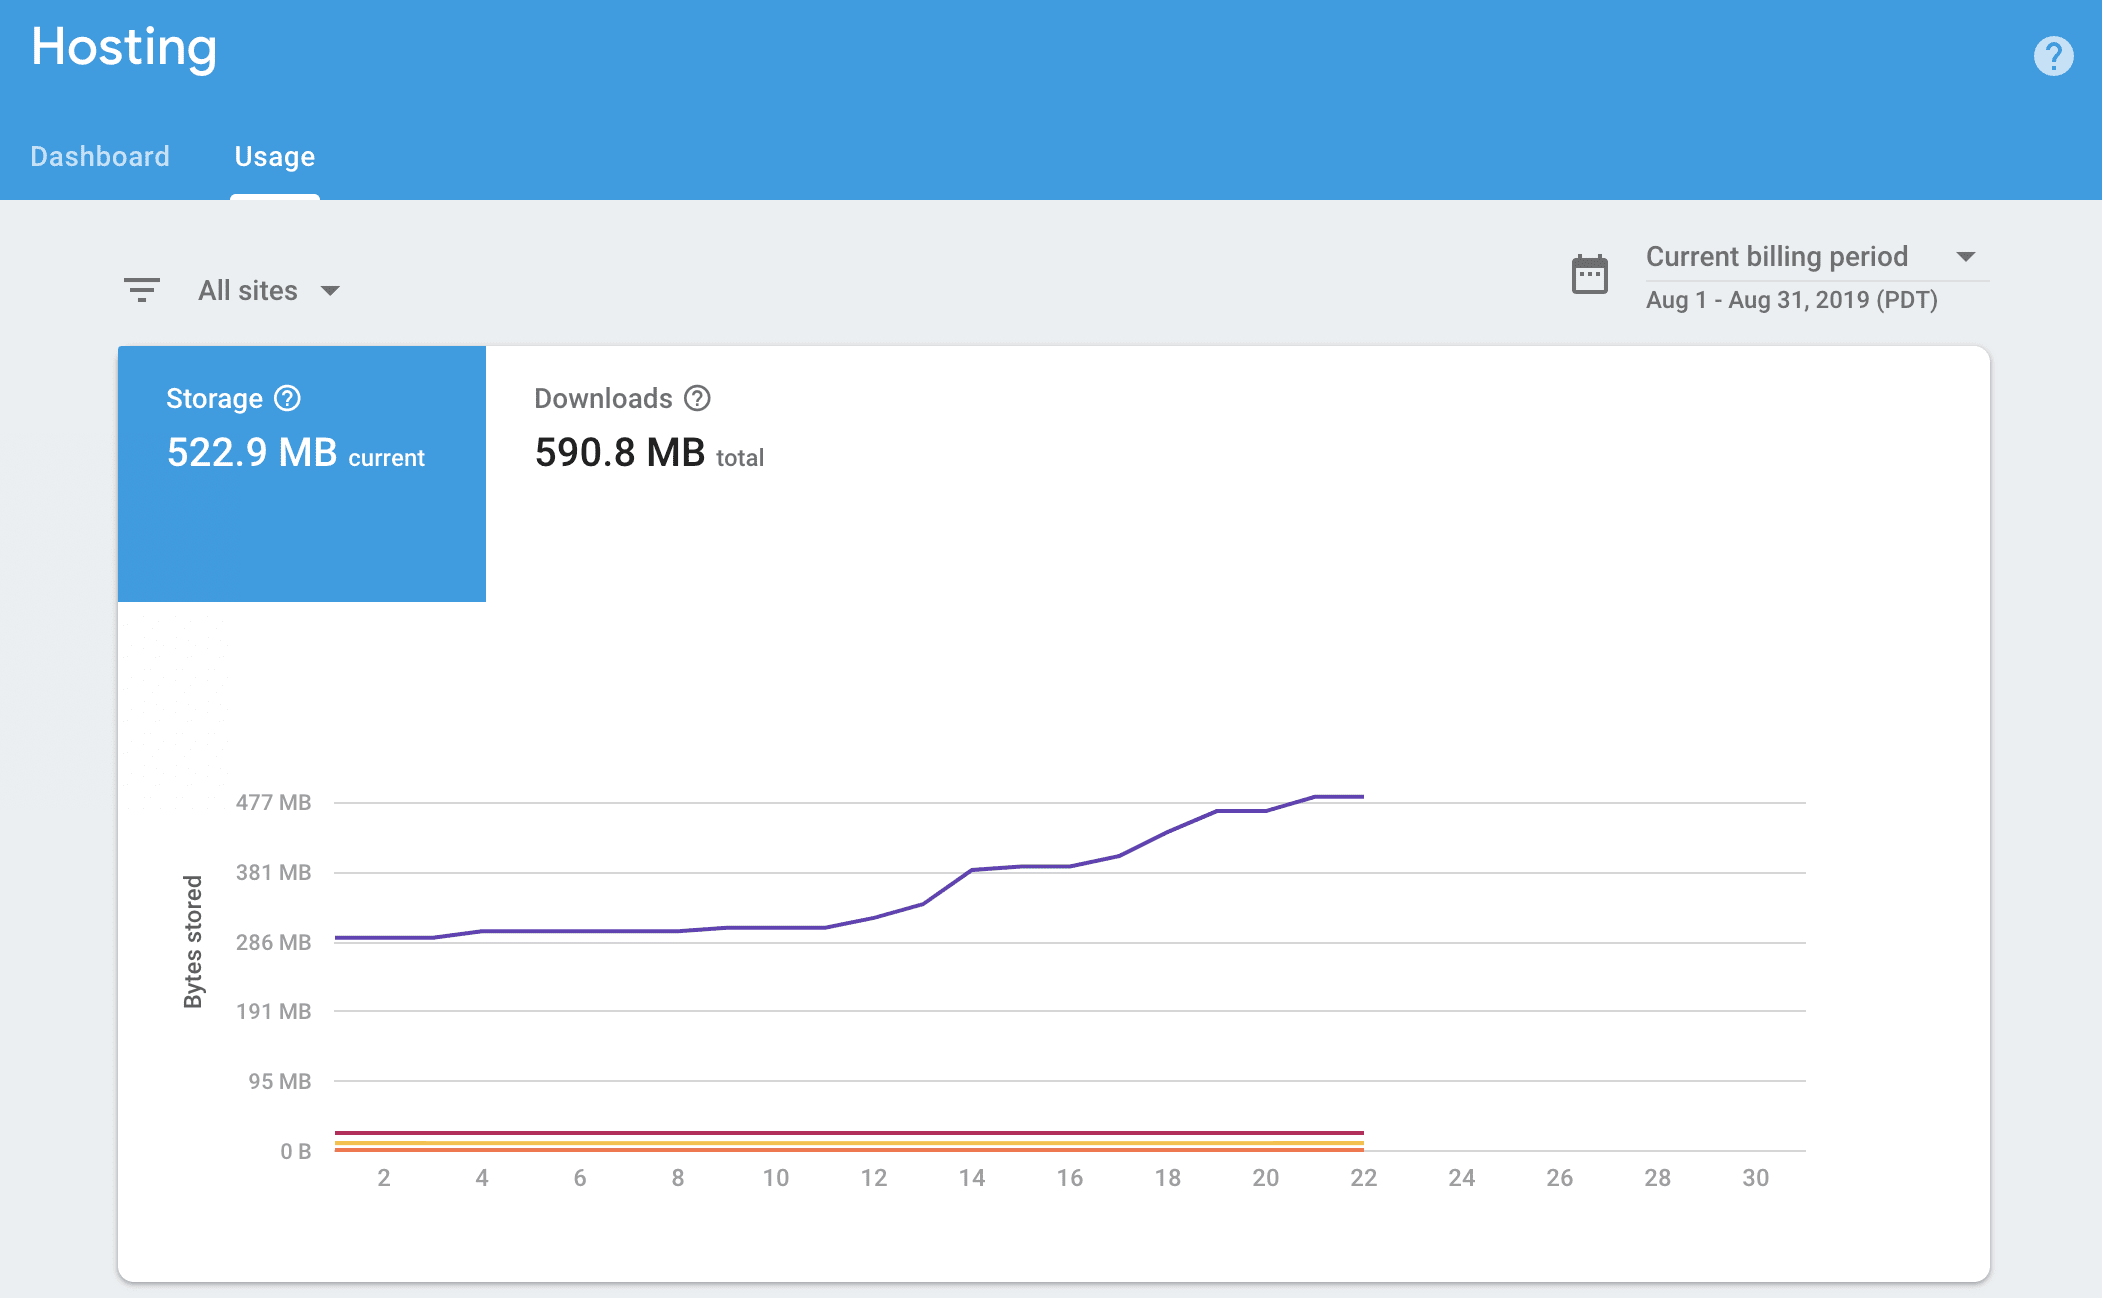 hosting usage